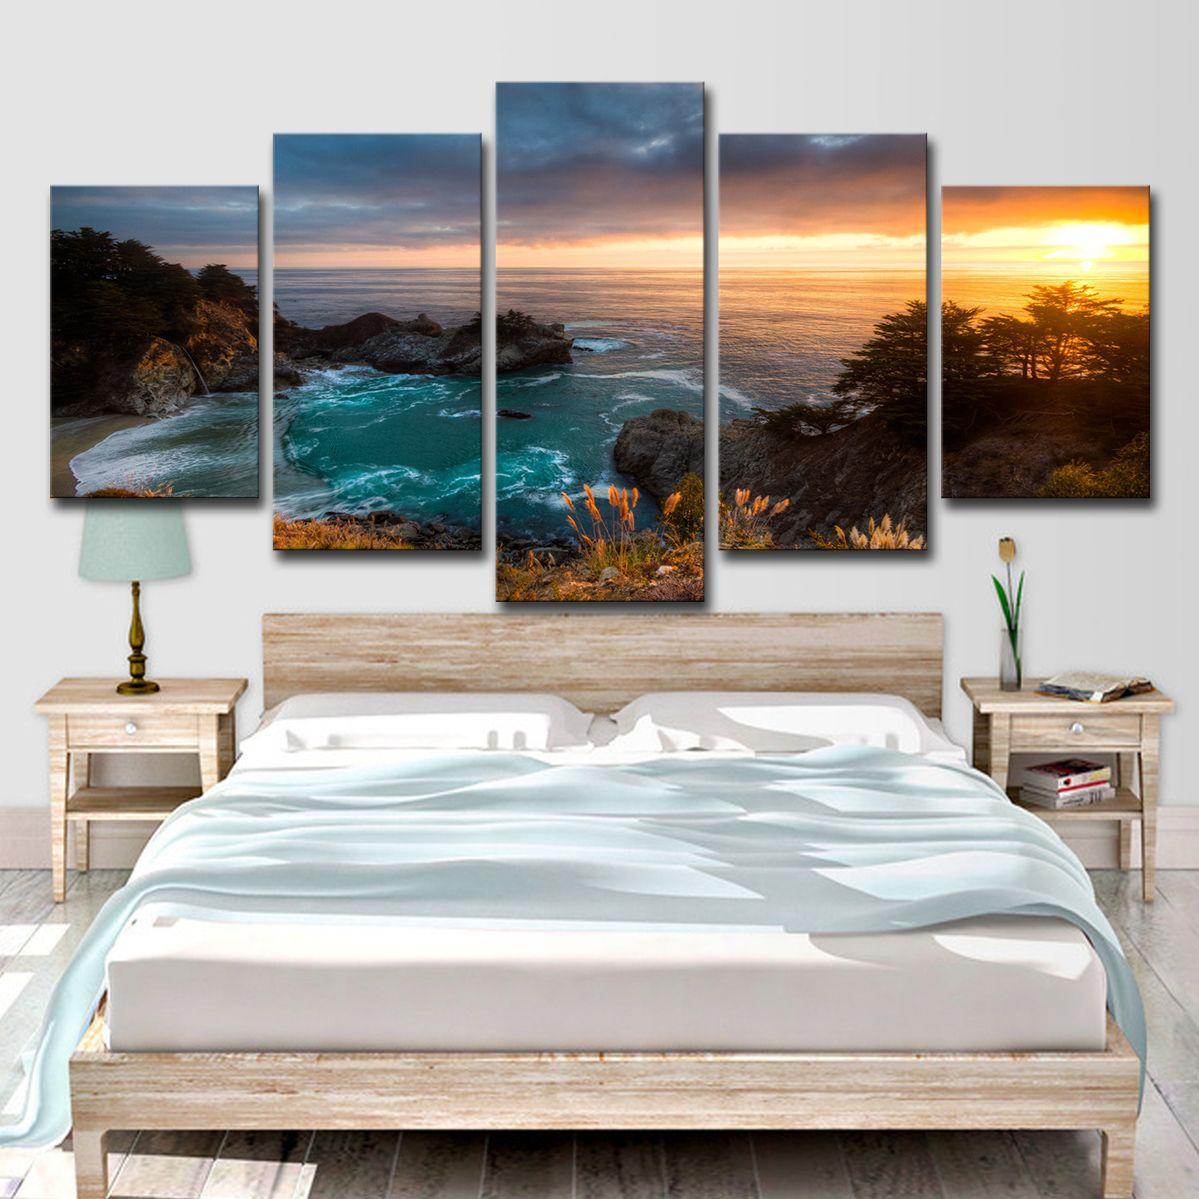 Modern HD Impresso Canvas Poster Home Decor Pintura Arte Modular 5 Painel Sunrise Seaview Sala Retratos Da Parede